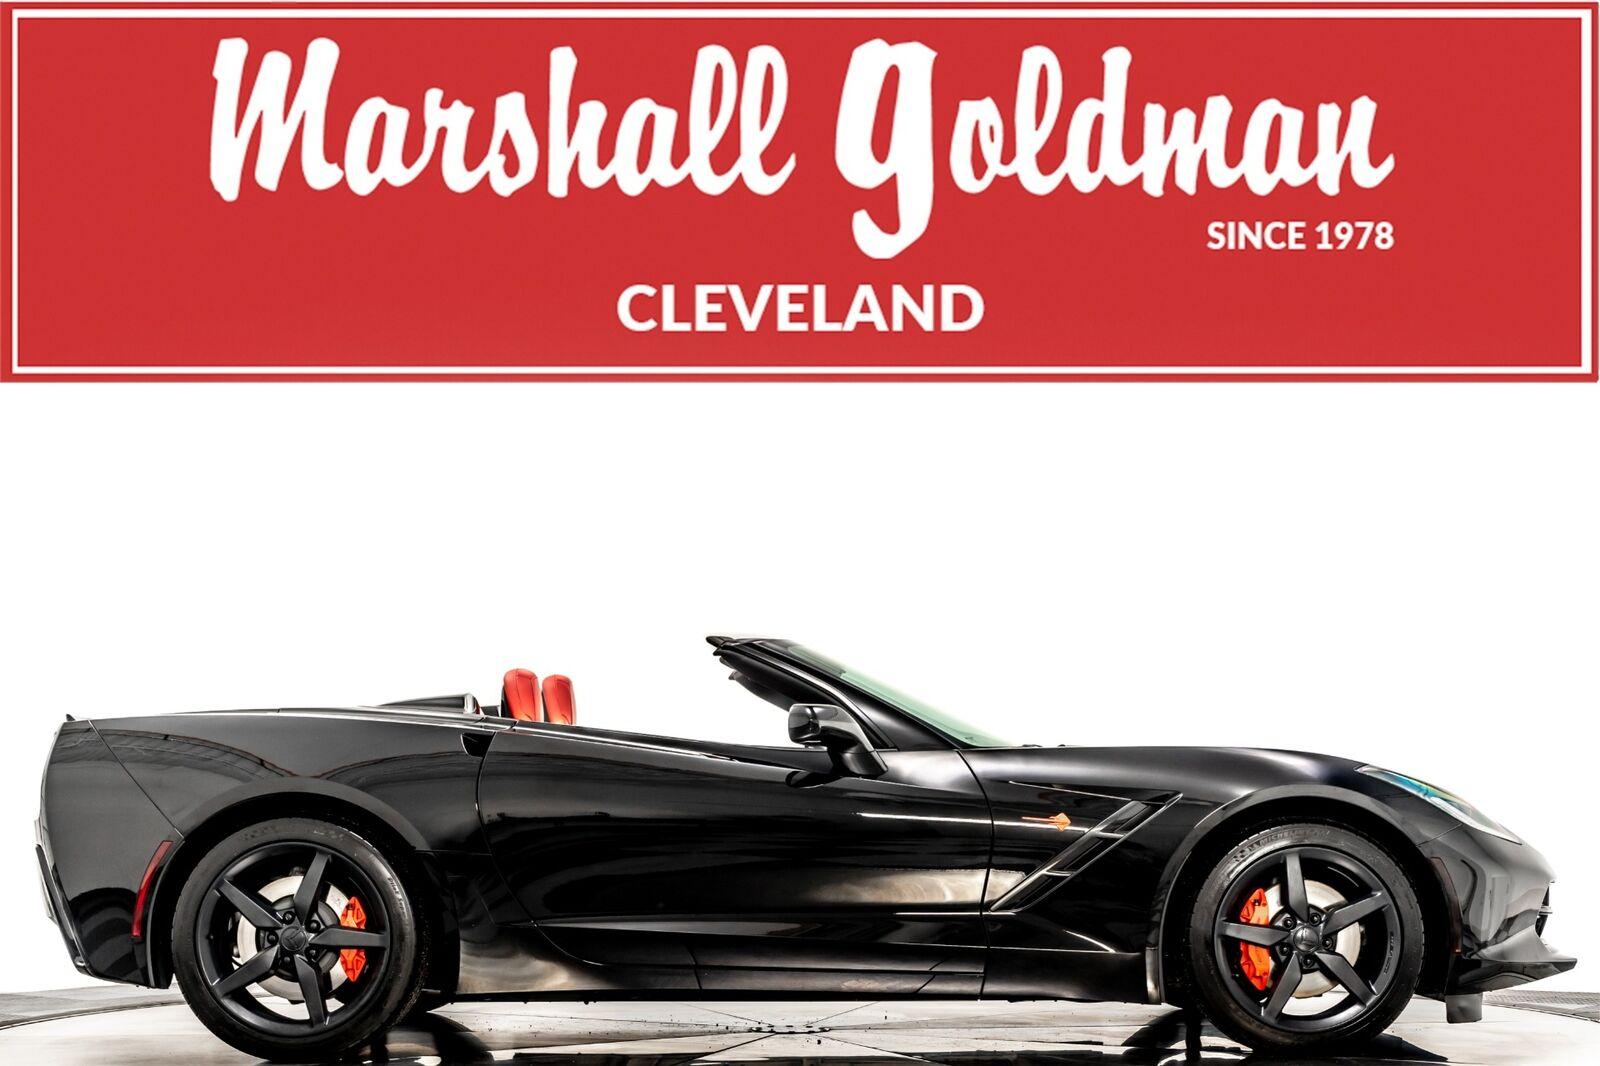 2014 Black Chevrolet Corvette Convertible 2LT   C7 Corvette Photo 1